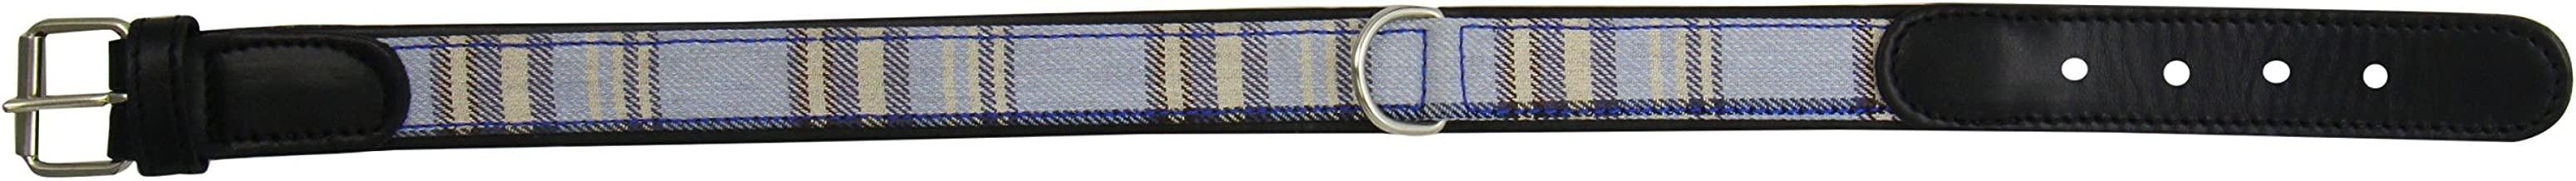 Petego La Cinopelca Cheri' Italian Leather Harness in Blue and Tartan Fabric, Large